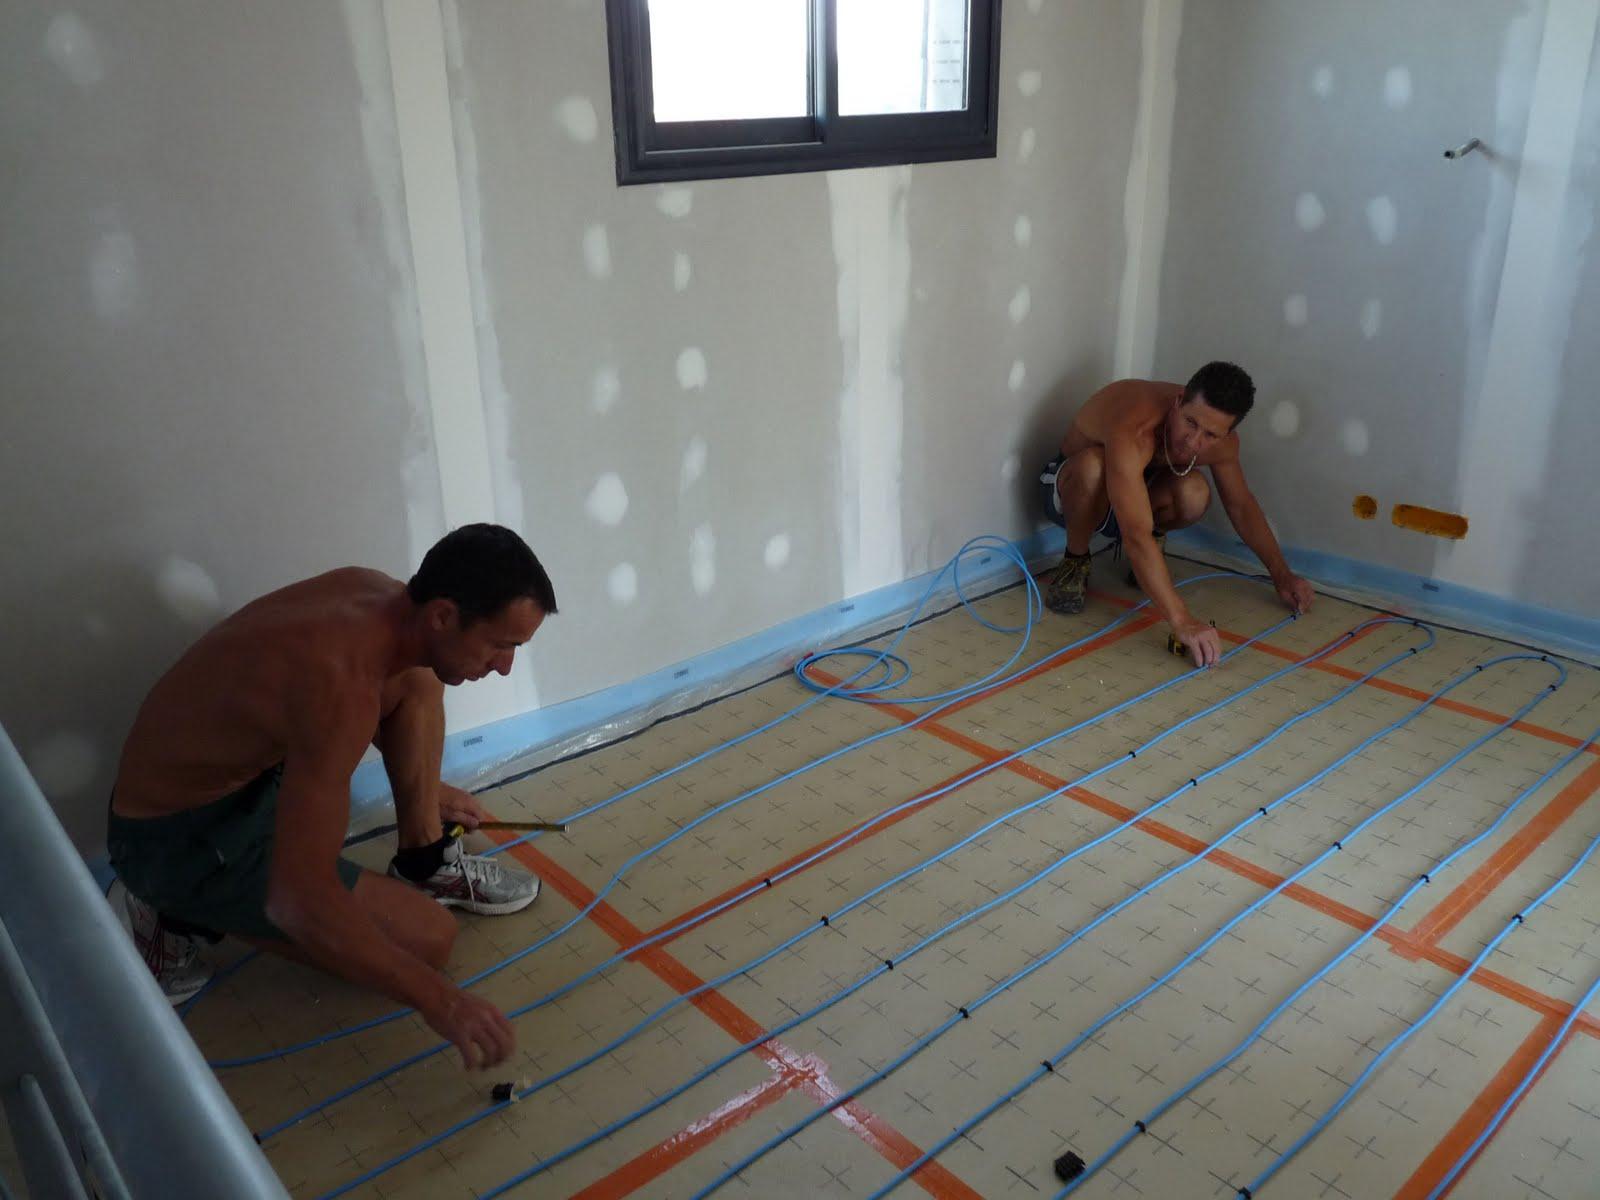 en direct du lanot pose du chauffage au sol. Black Bedroom Furniture Sets. Home Design Ideas